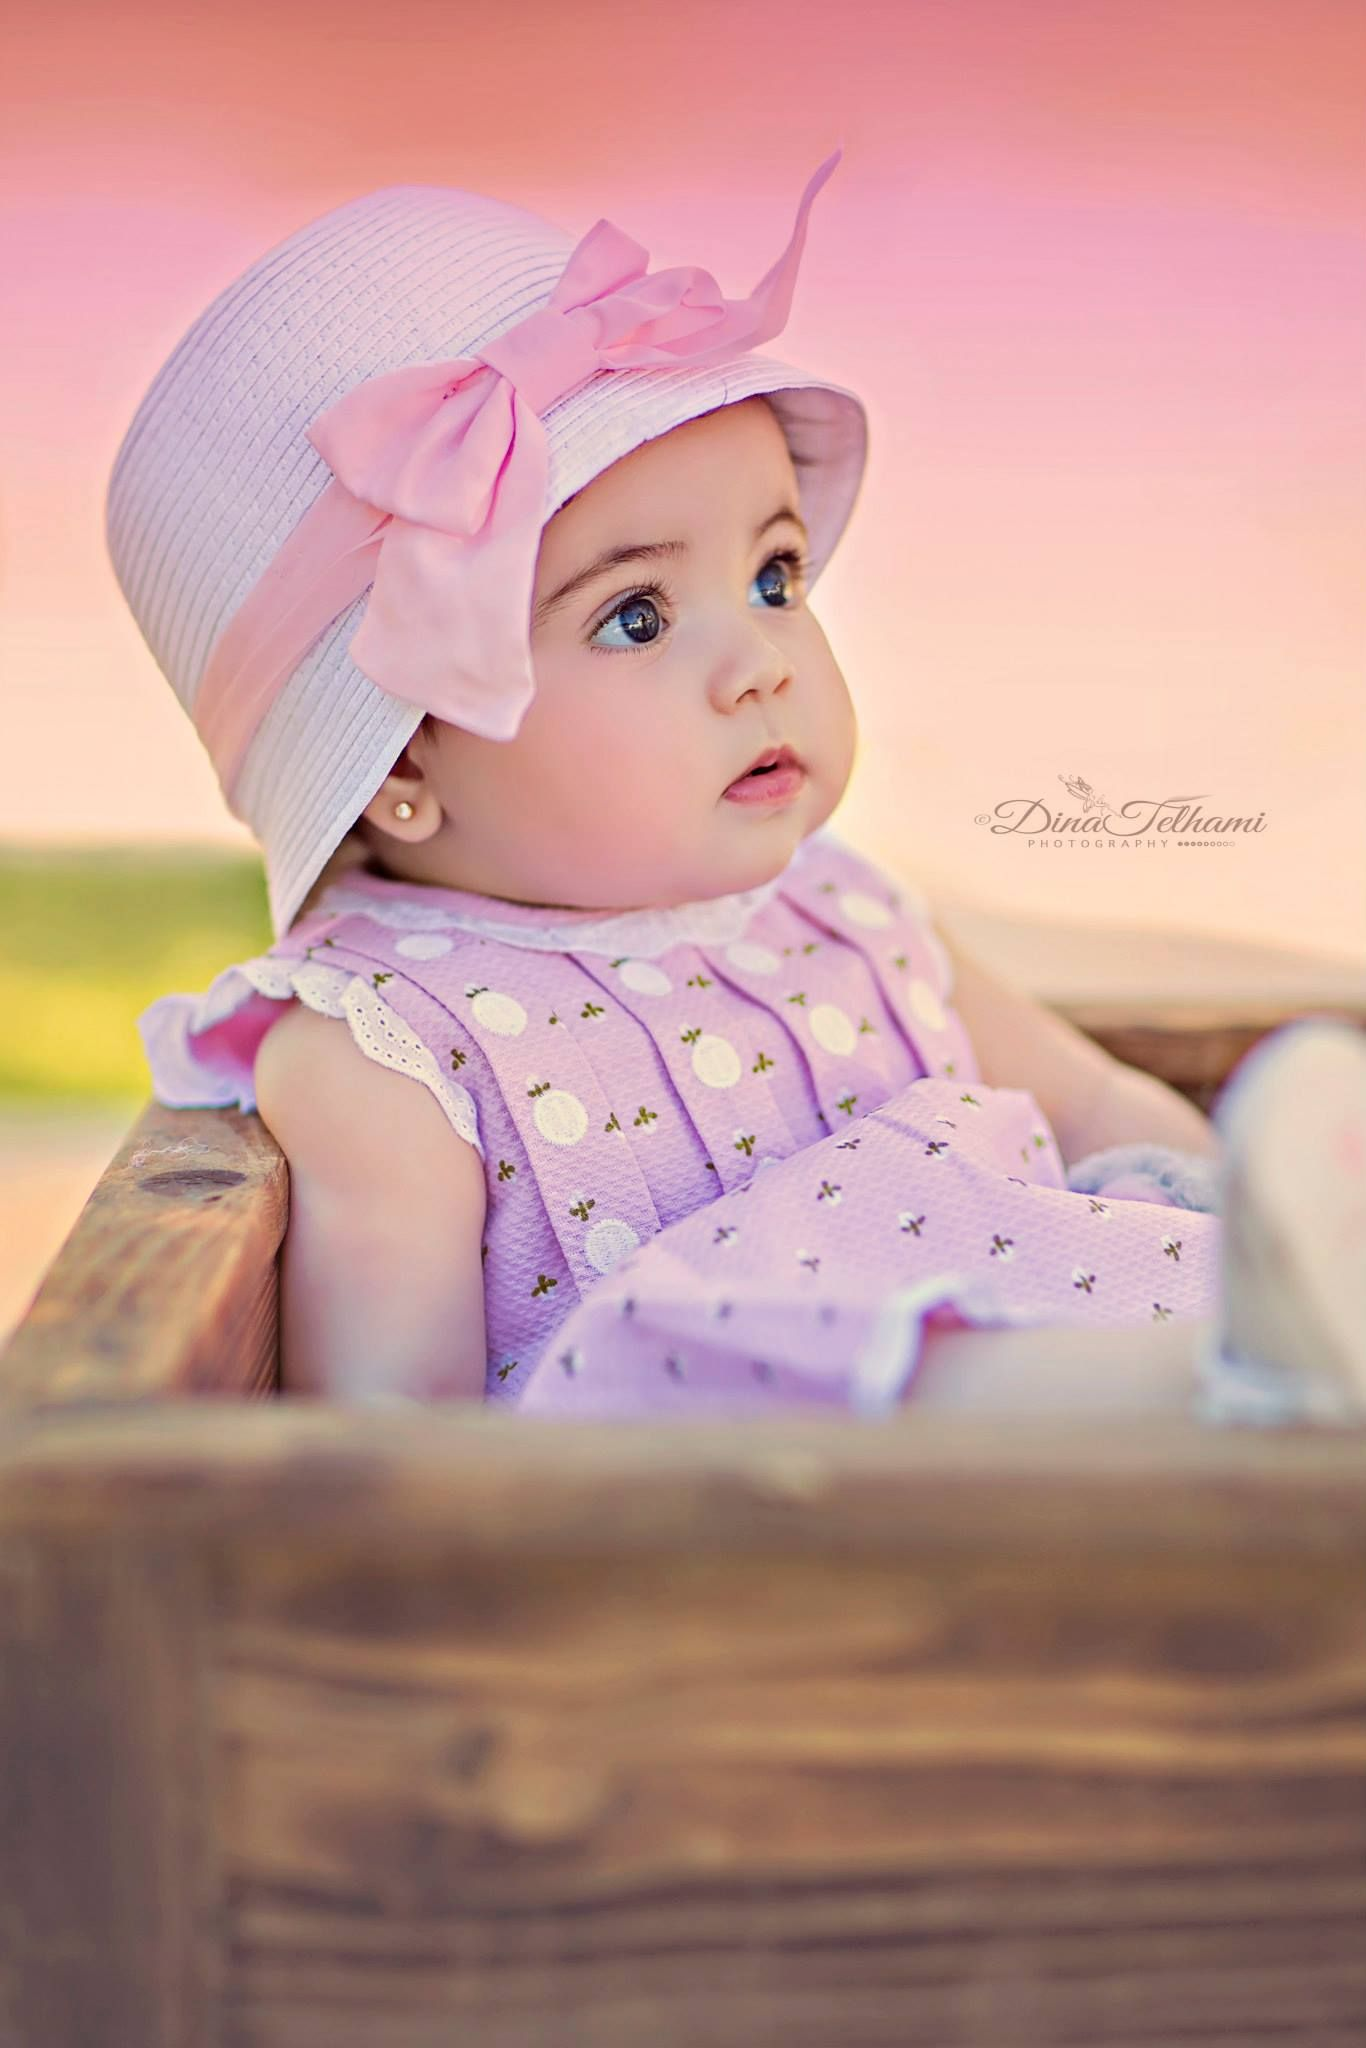 Gorgeous Lour Dina Telhami Photography Cute Kids Photos Cute Kids Pics Cute Baby Wallpaper